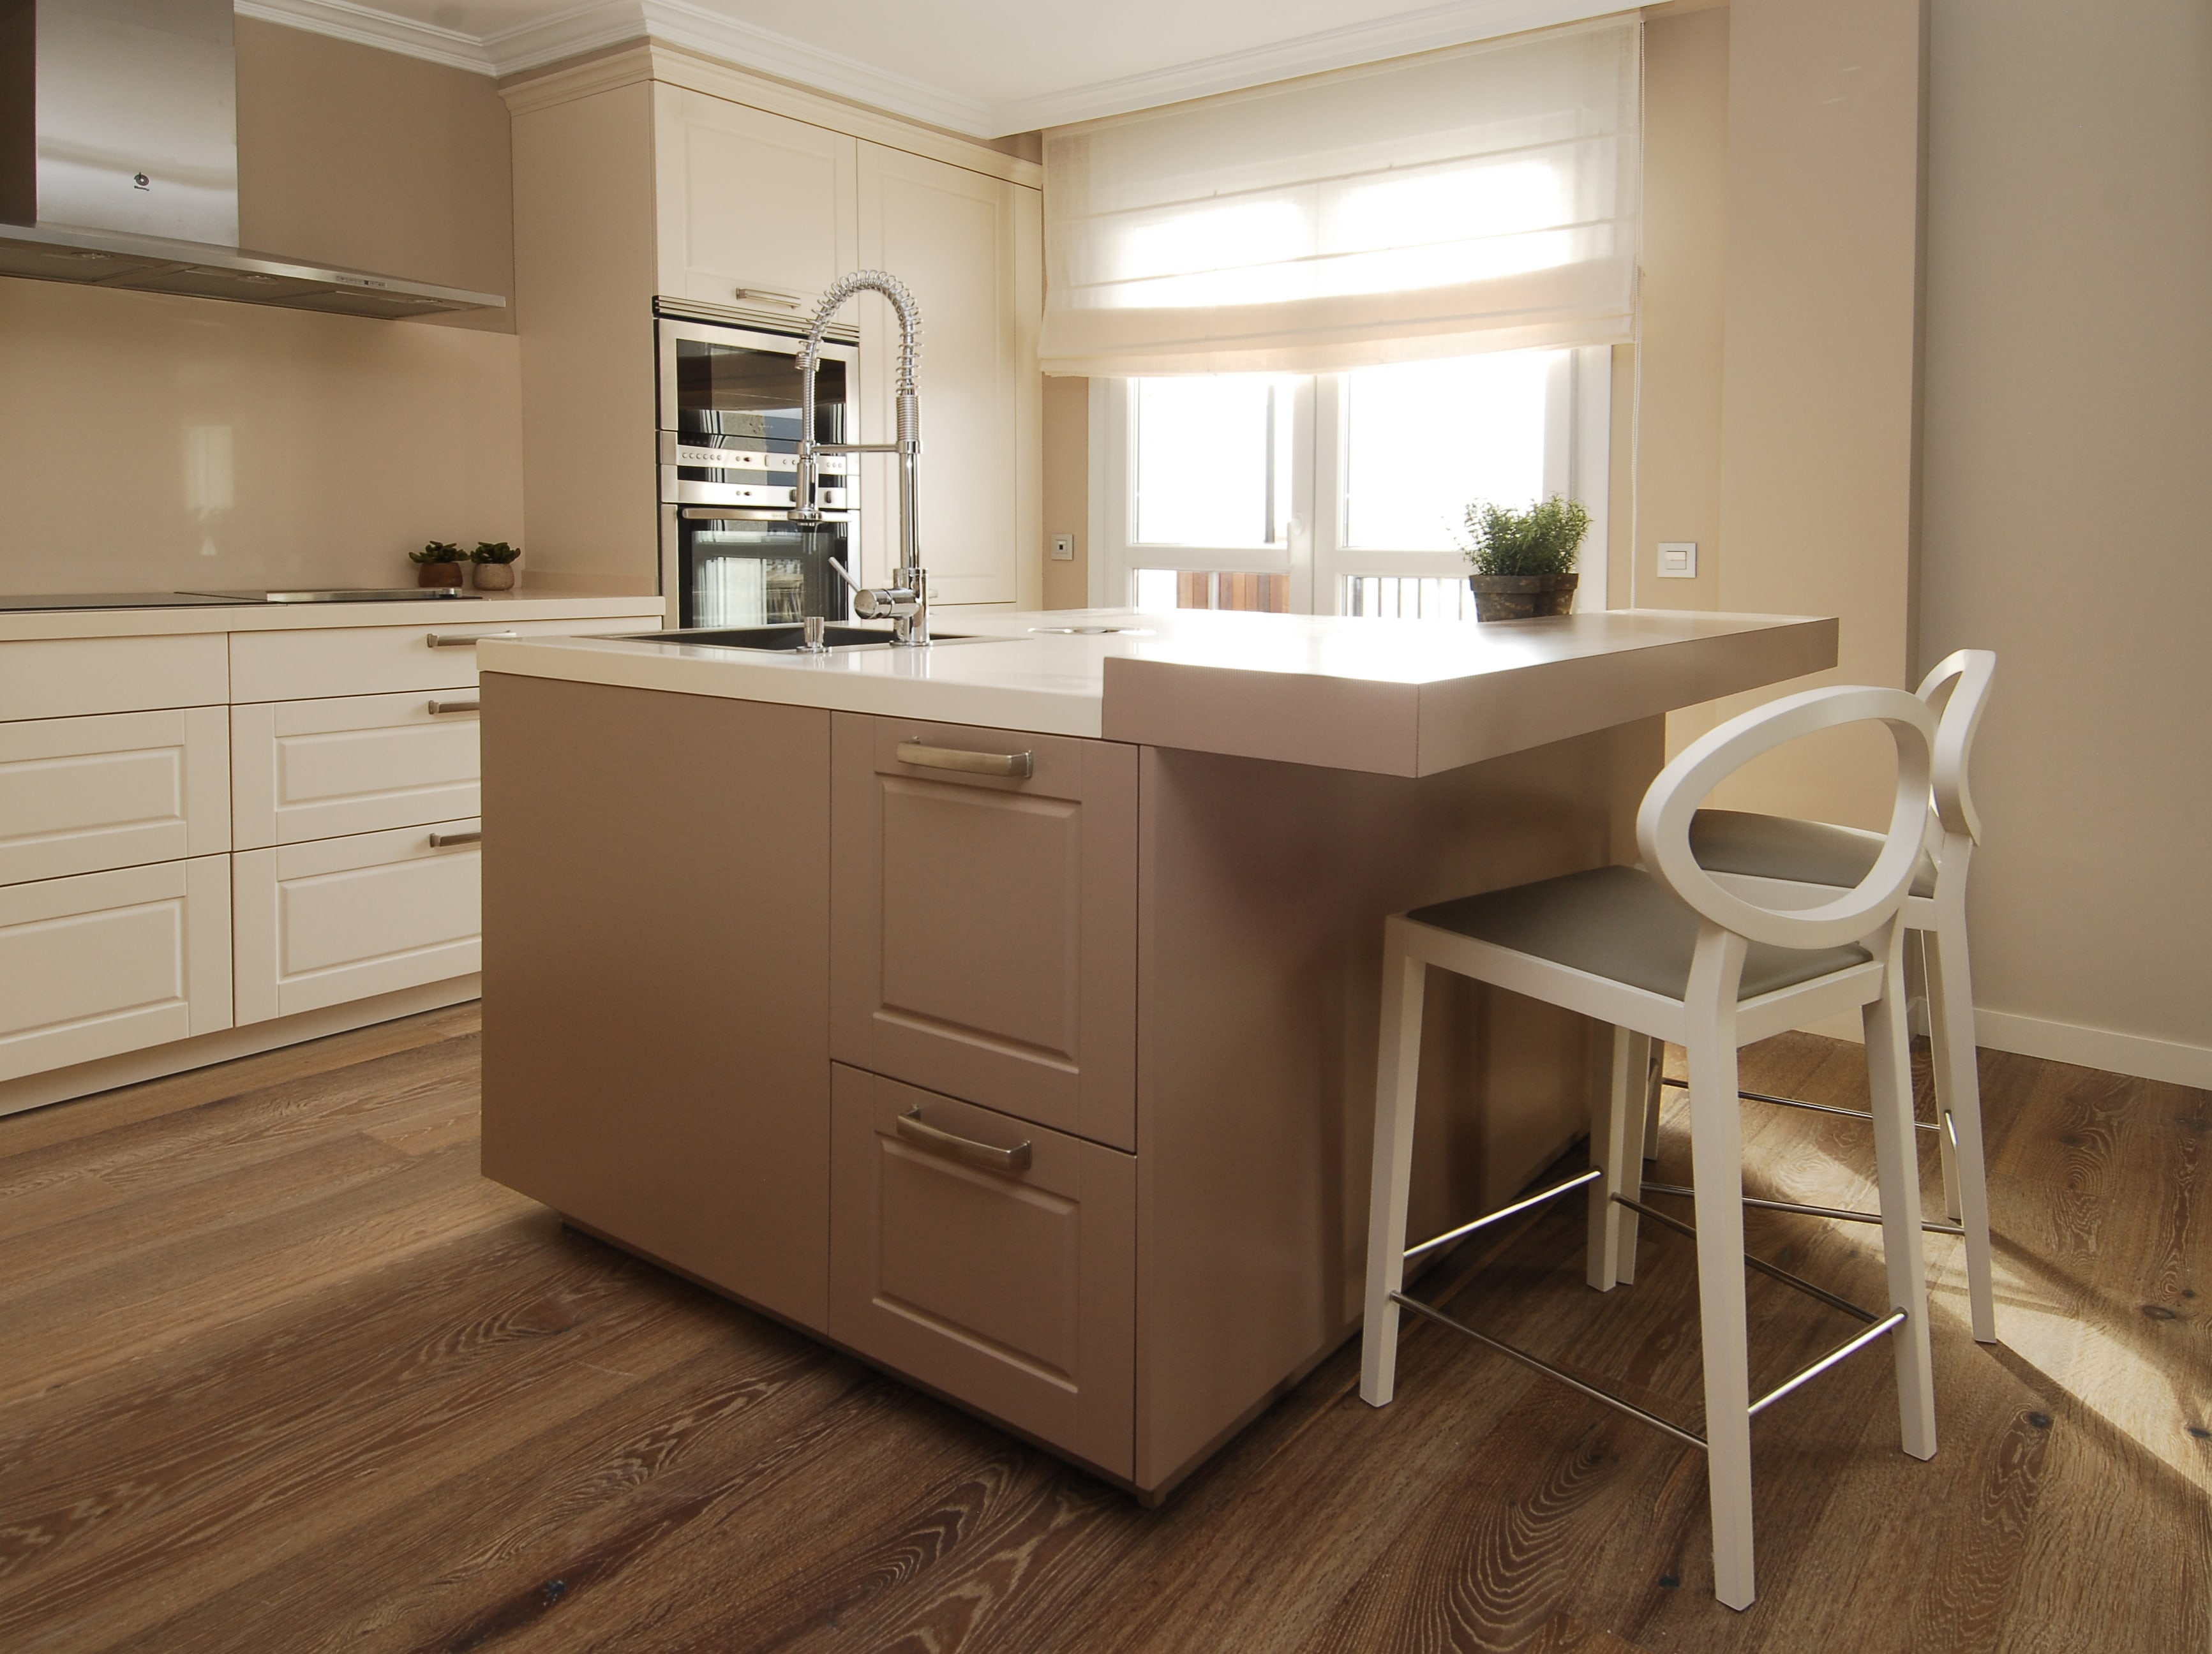 Dise o interior casa amorebieta bizkaia un duplex con for Diseno de interiores apartamentos medellin